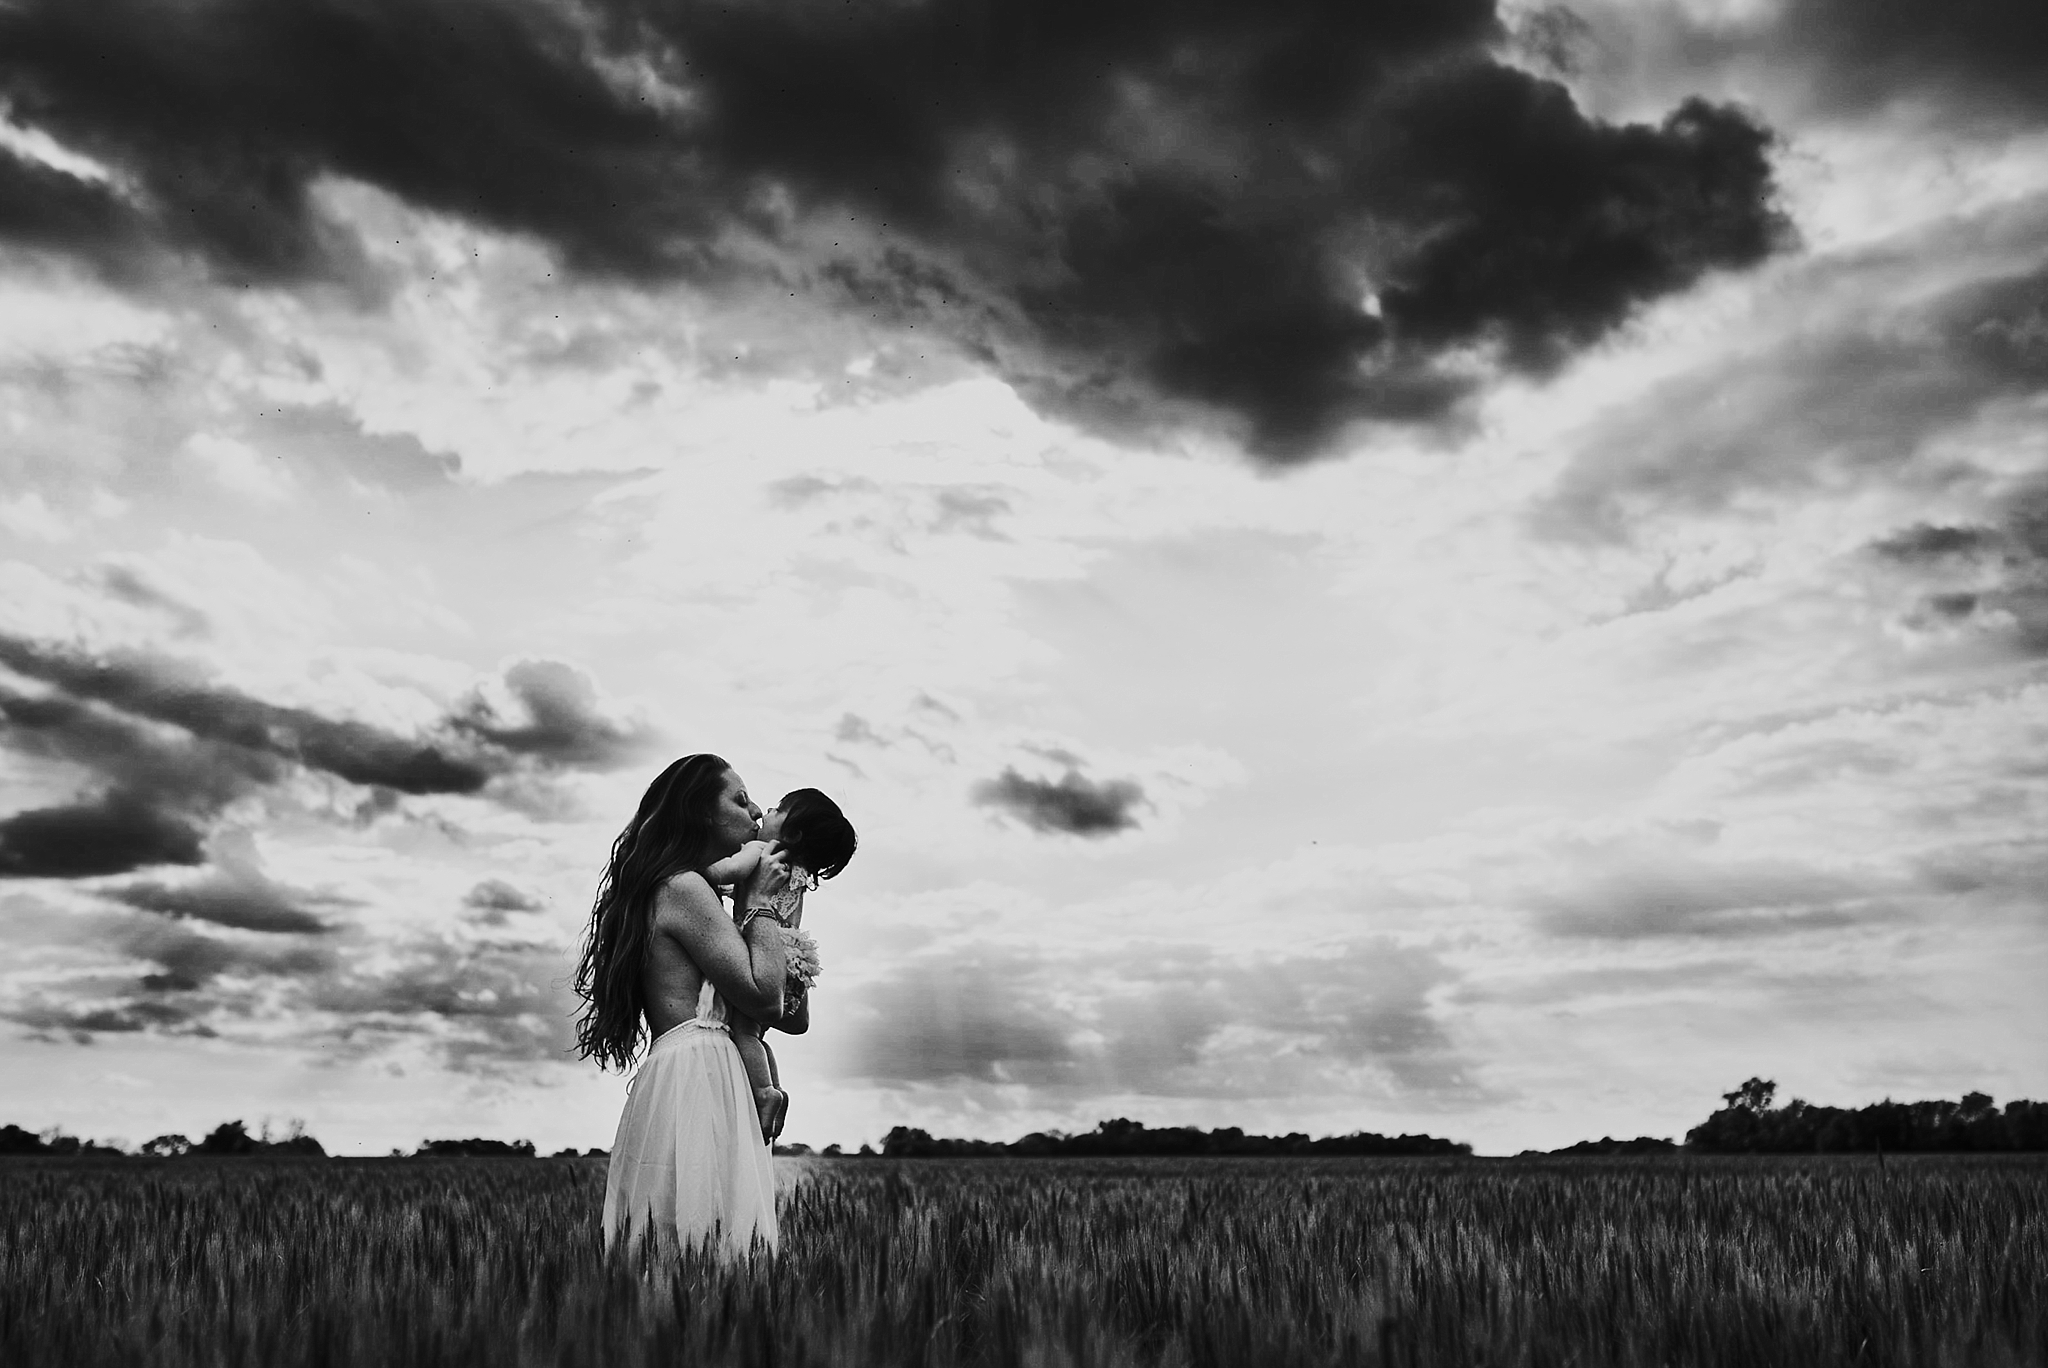 twyla jones photography - mother daughter - field and forest-4541_treasure coast florida.jpg